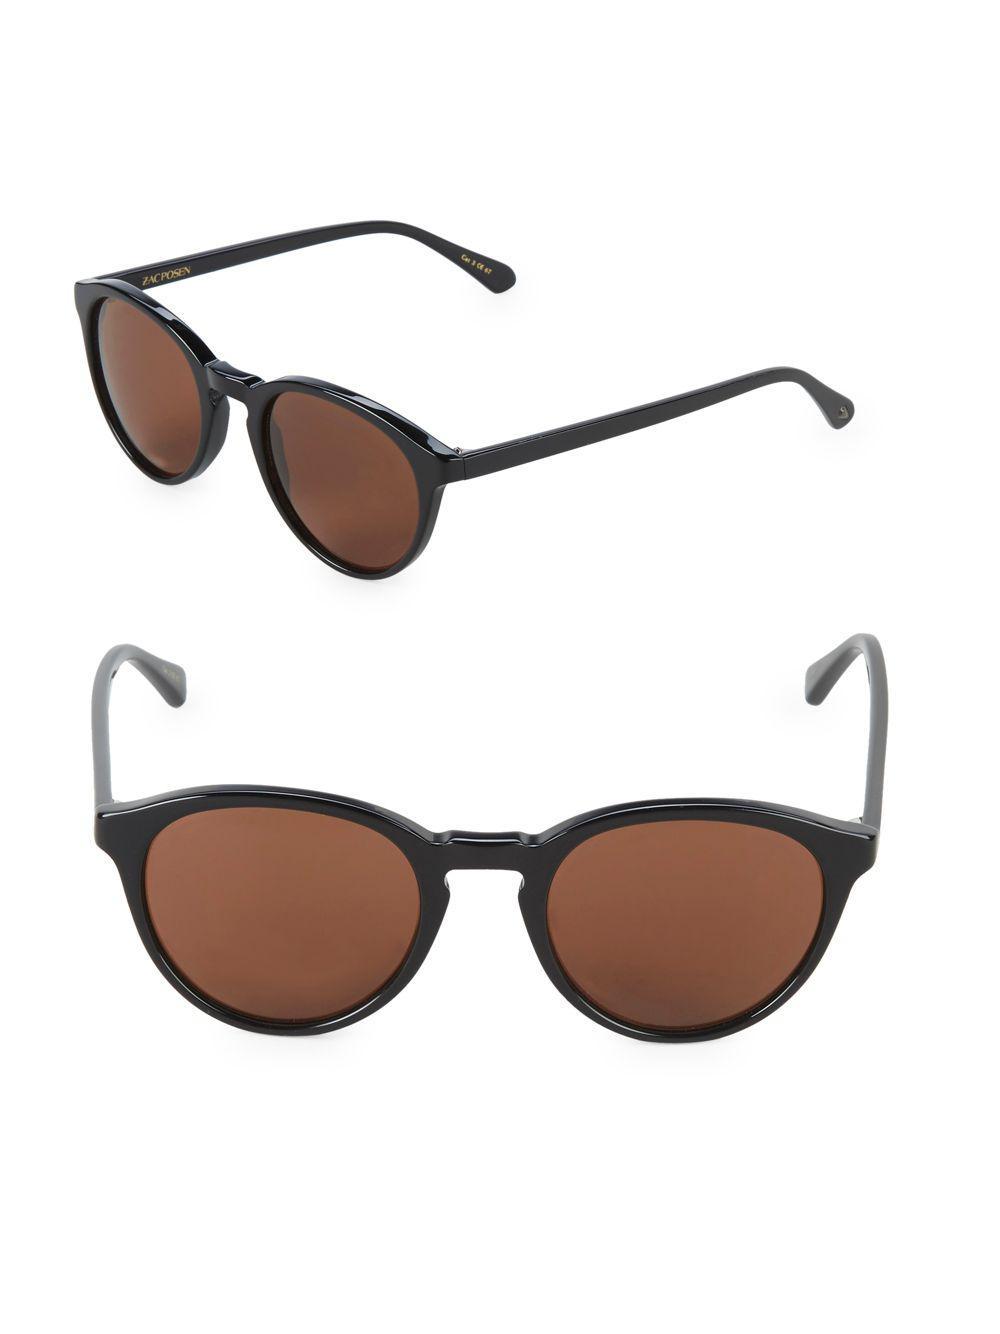 495337dce88 Lyst - Zac Posen Kylian 49mm Round Sunglasses in Black